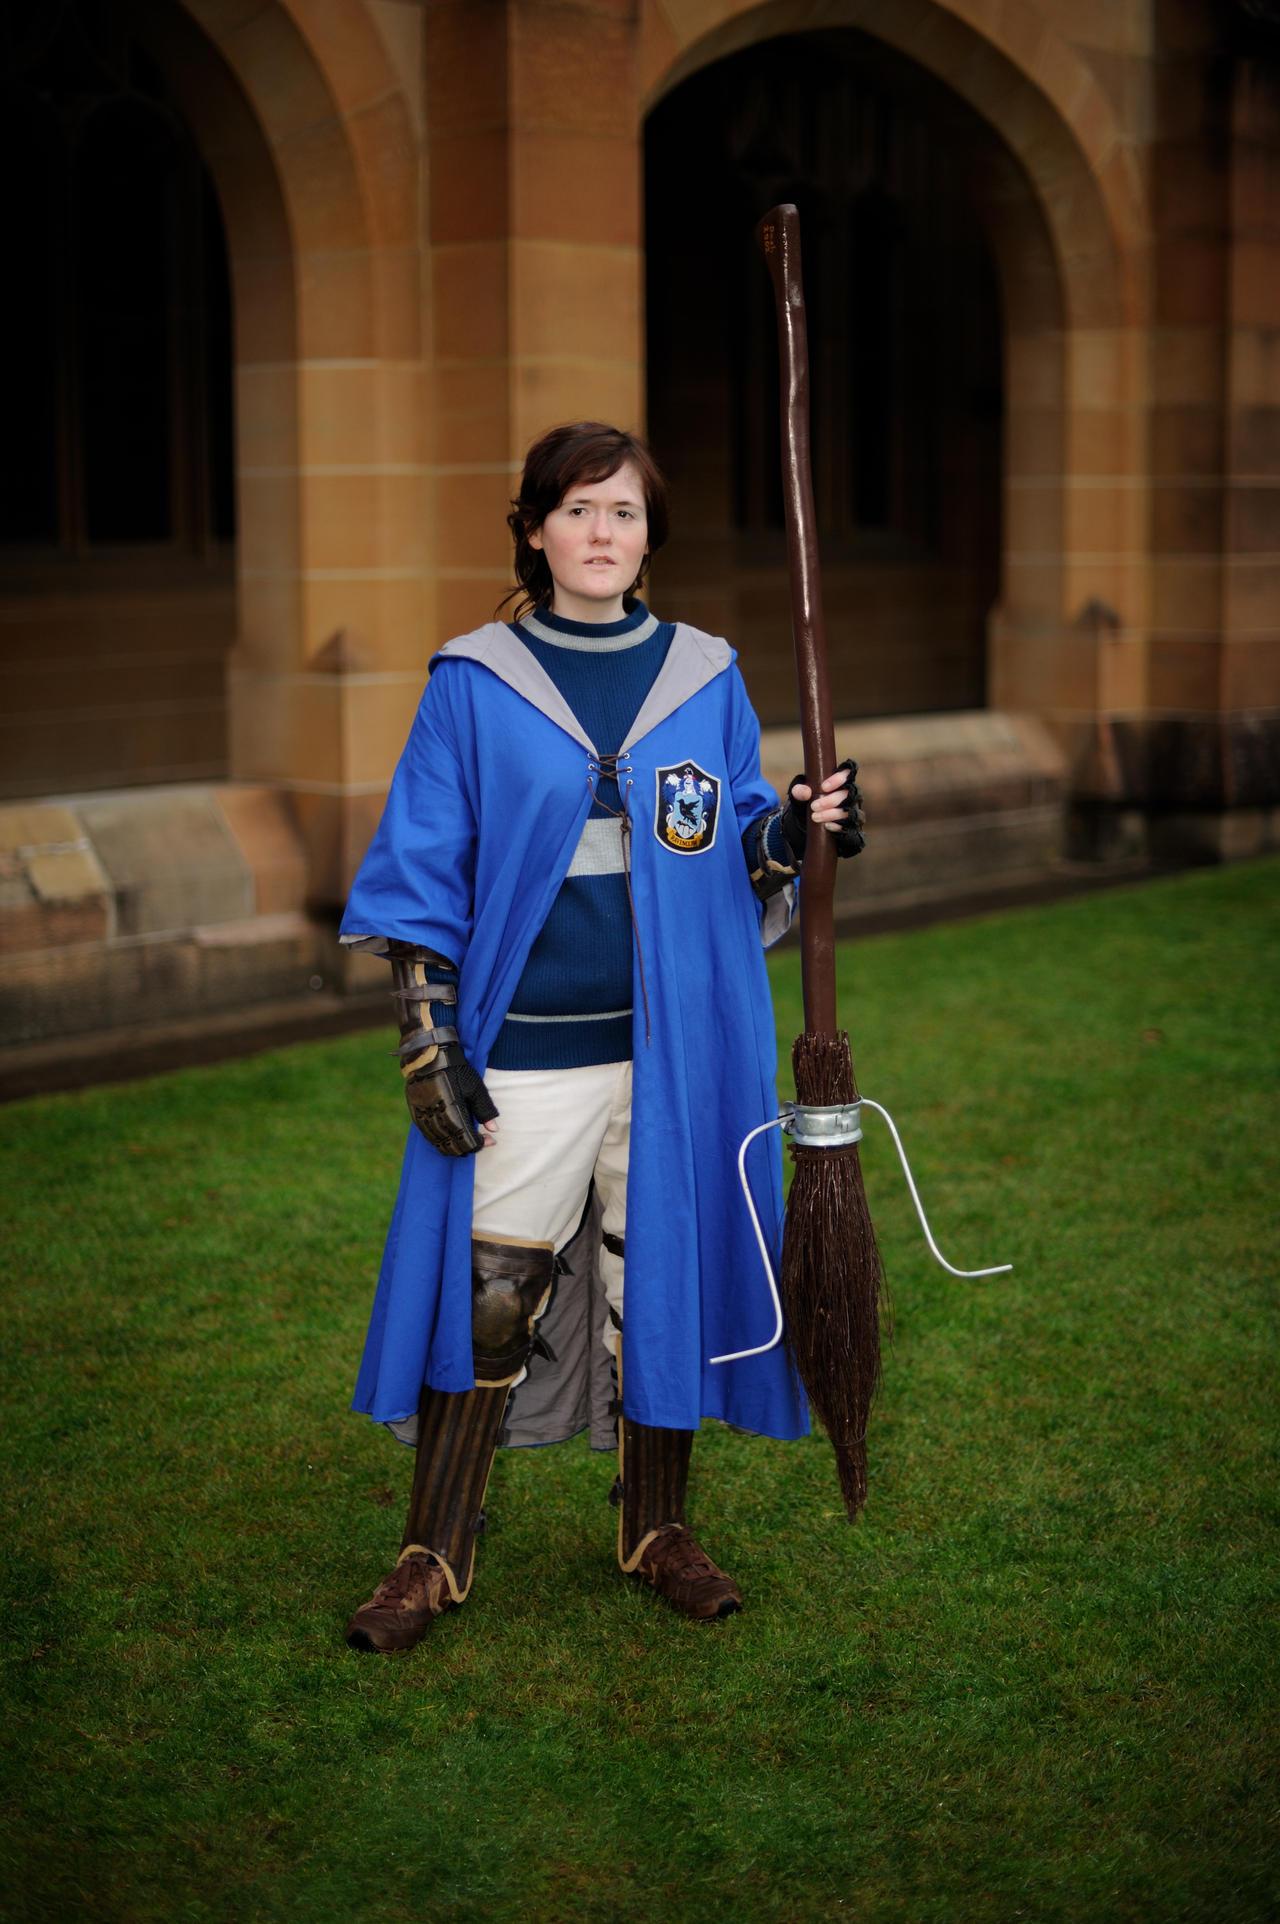 Ravenclaw quidditch player cosplay by DashyProps on DeviantArt